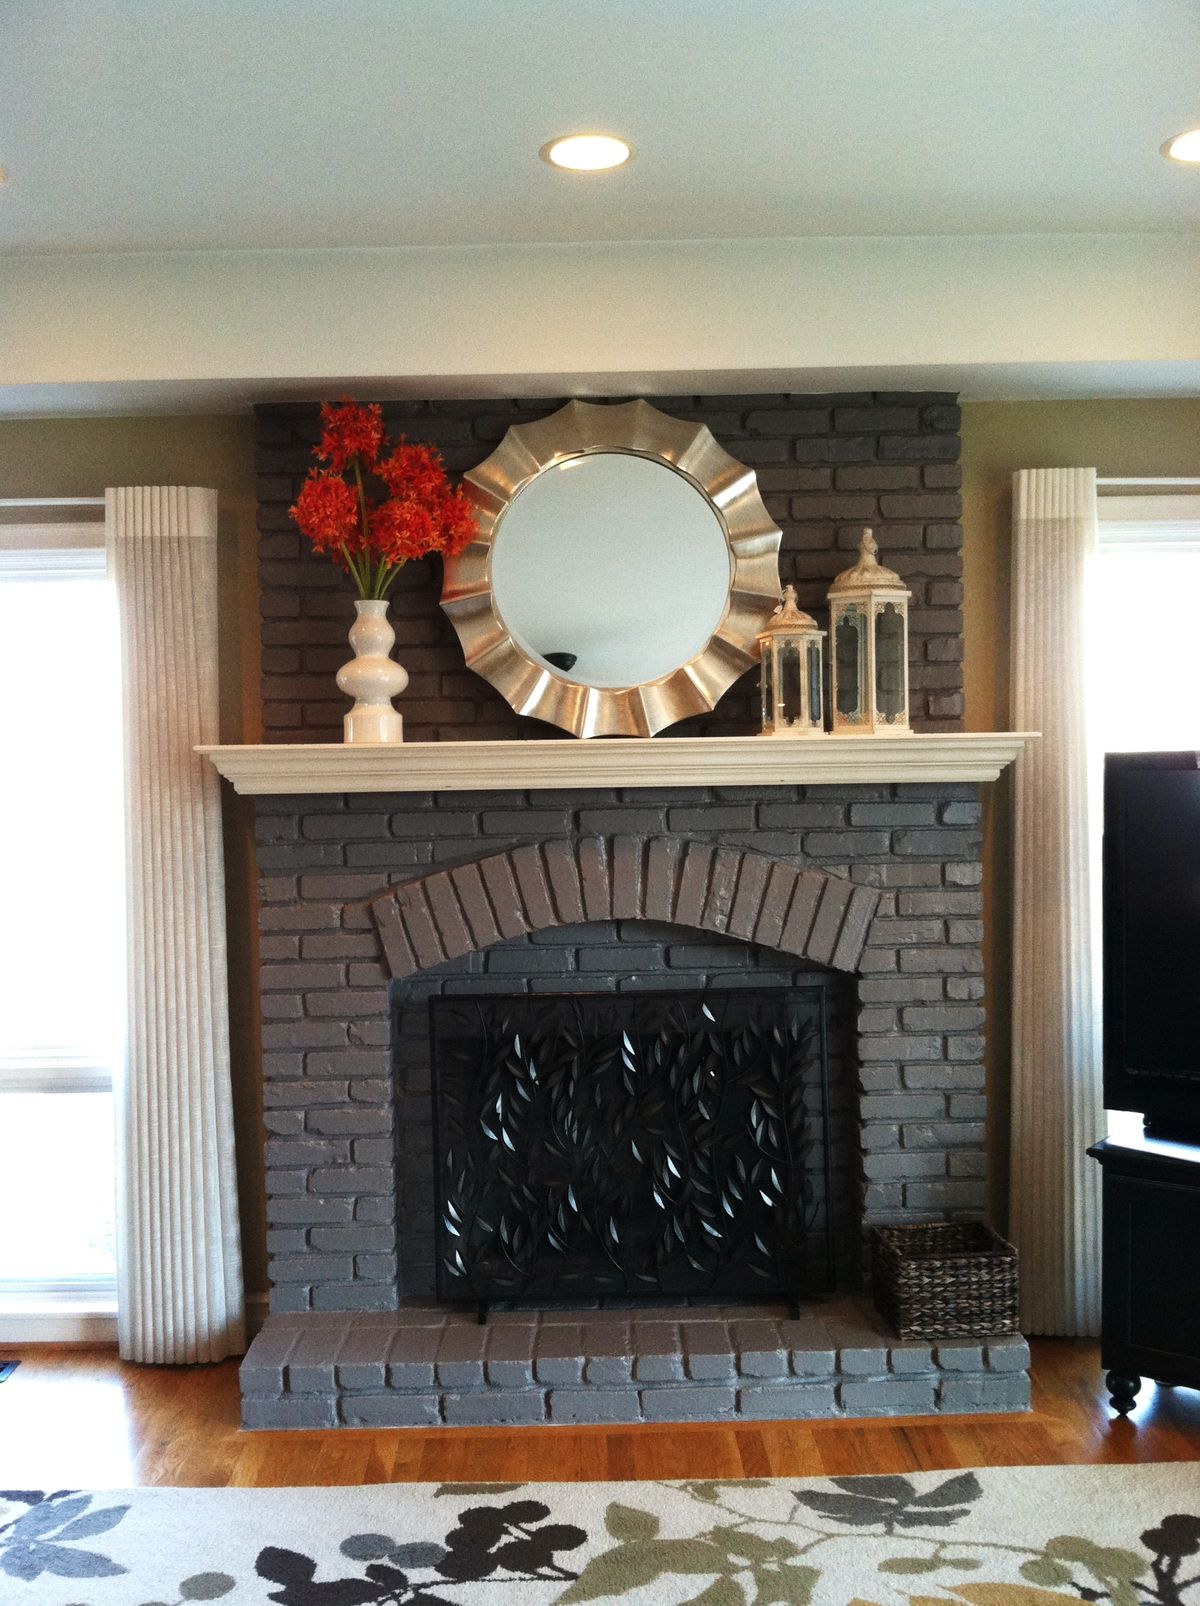 chemin e peinte foyer brique pinterest chemin es peintes chemin e et peindre. Black Bedroom Furniture Sets. Home Design Ideas